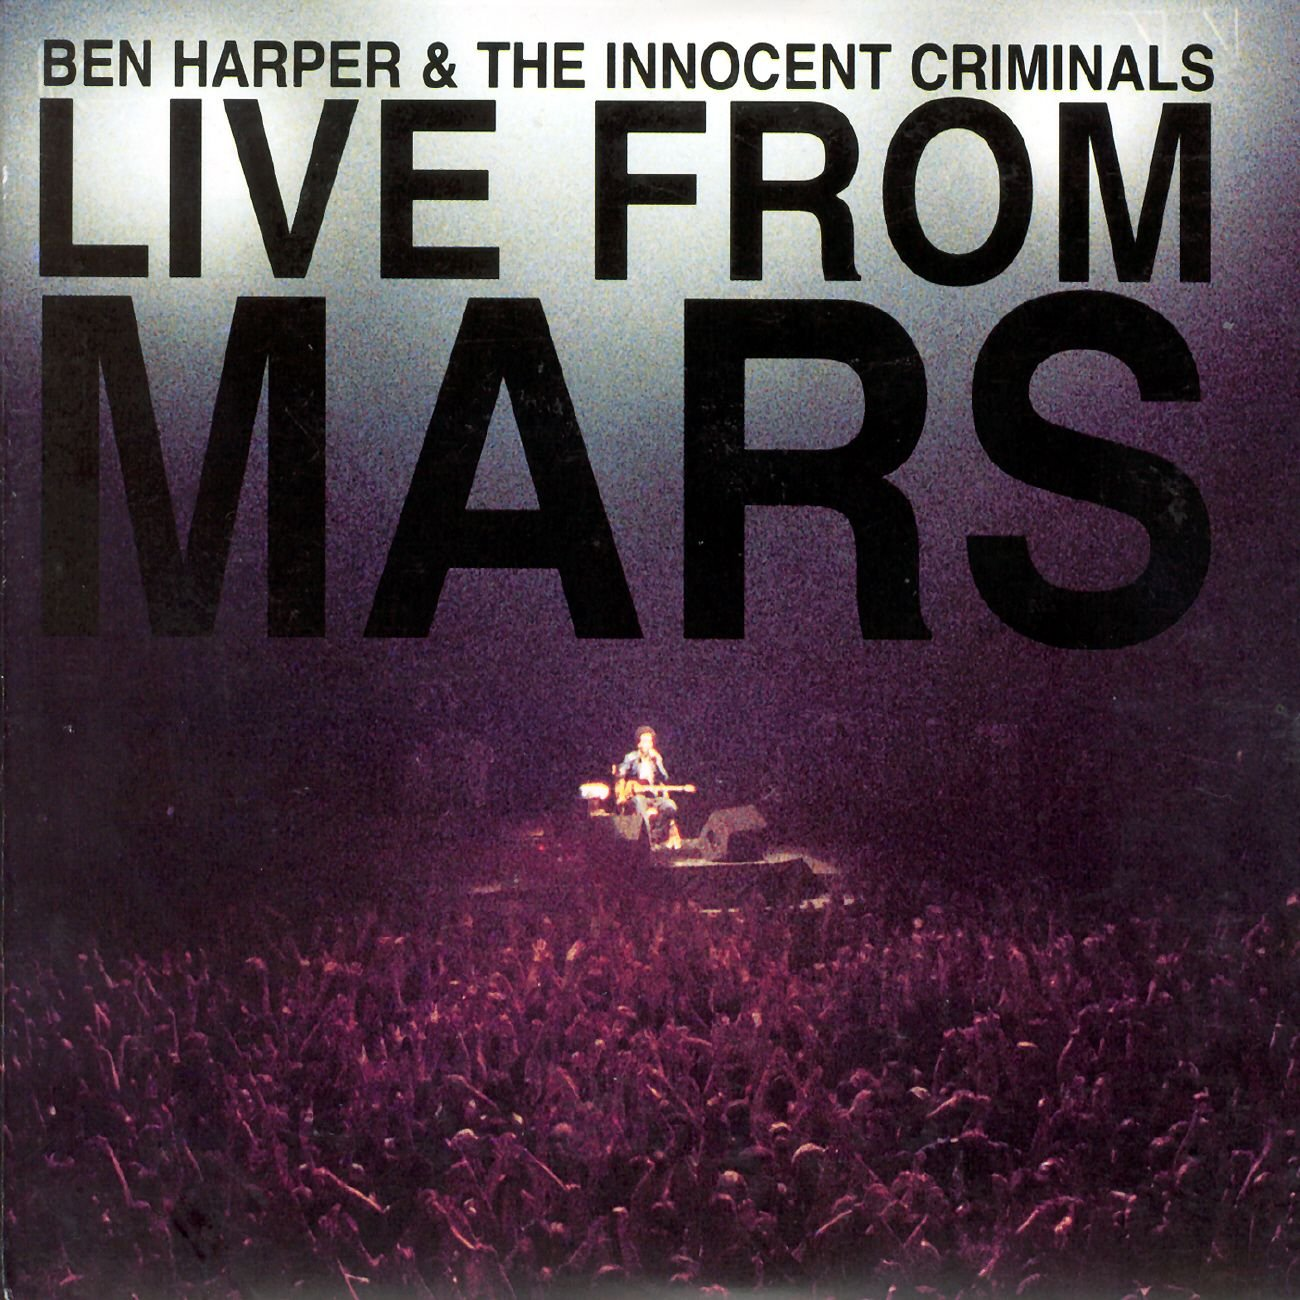 Live from Mars [Vinyl] by EMI MKTG